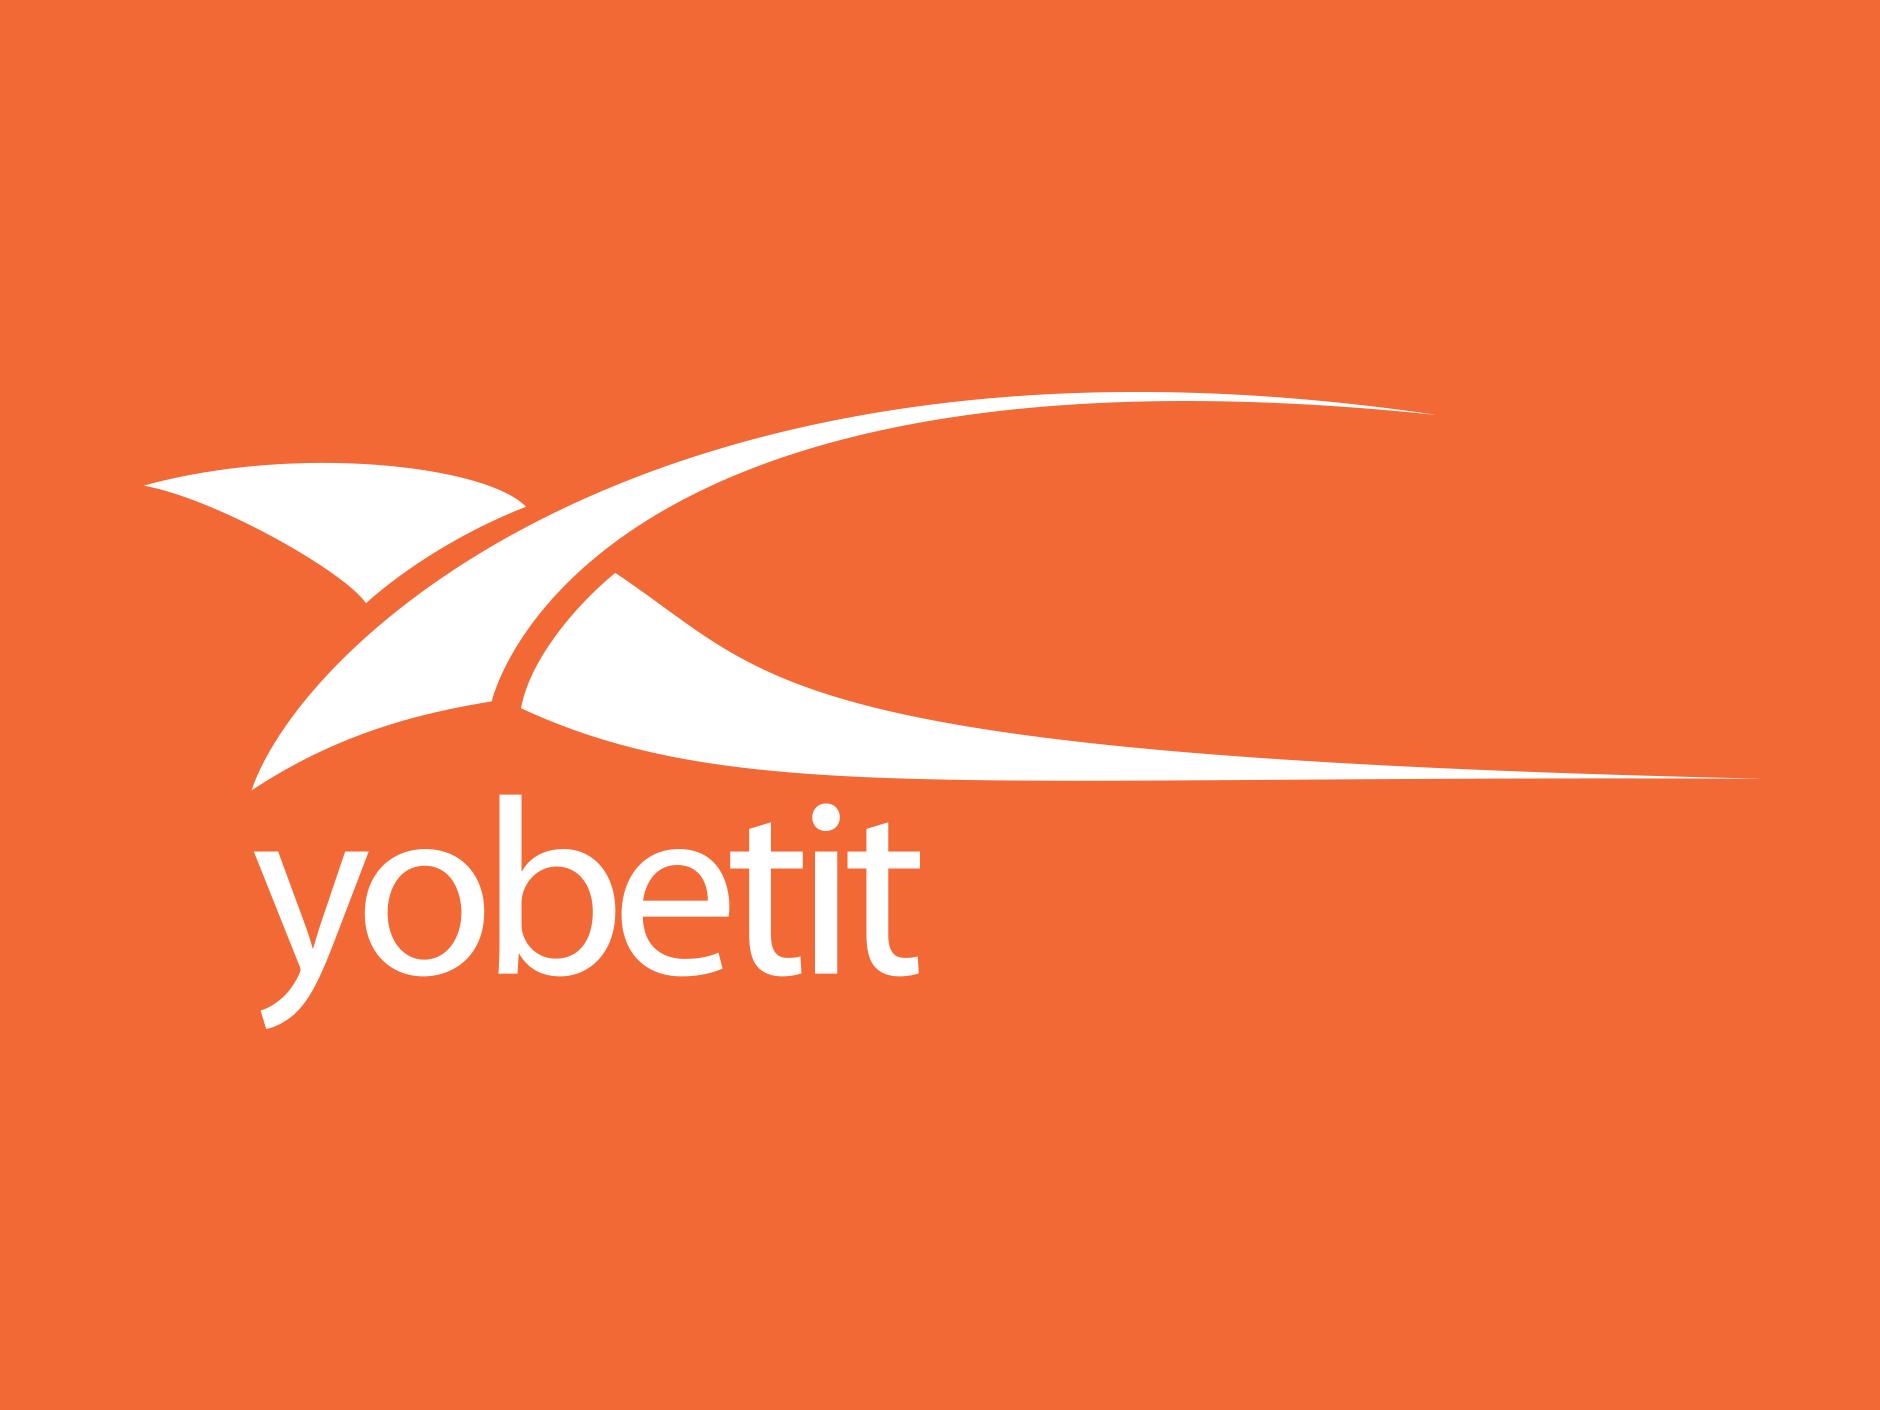 Yobetit